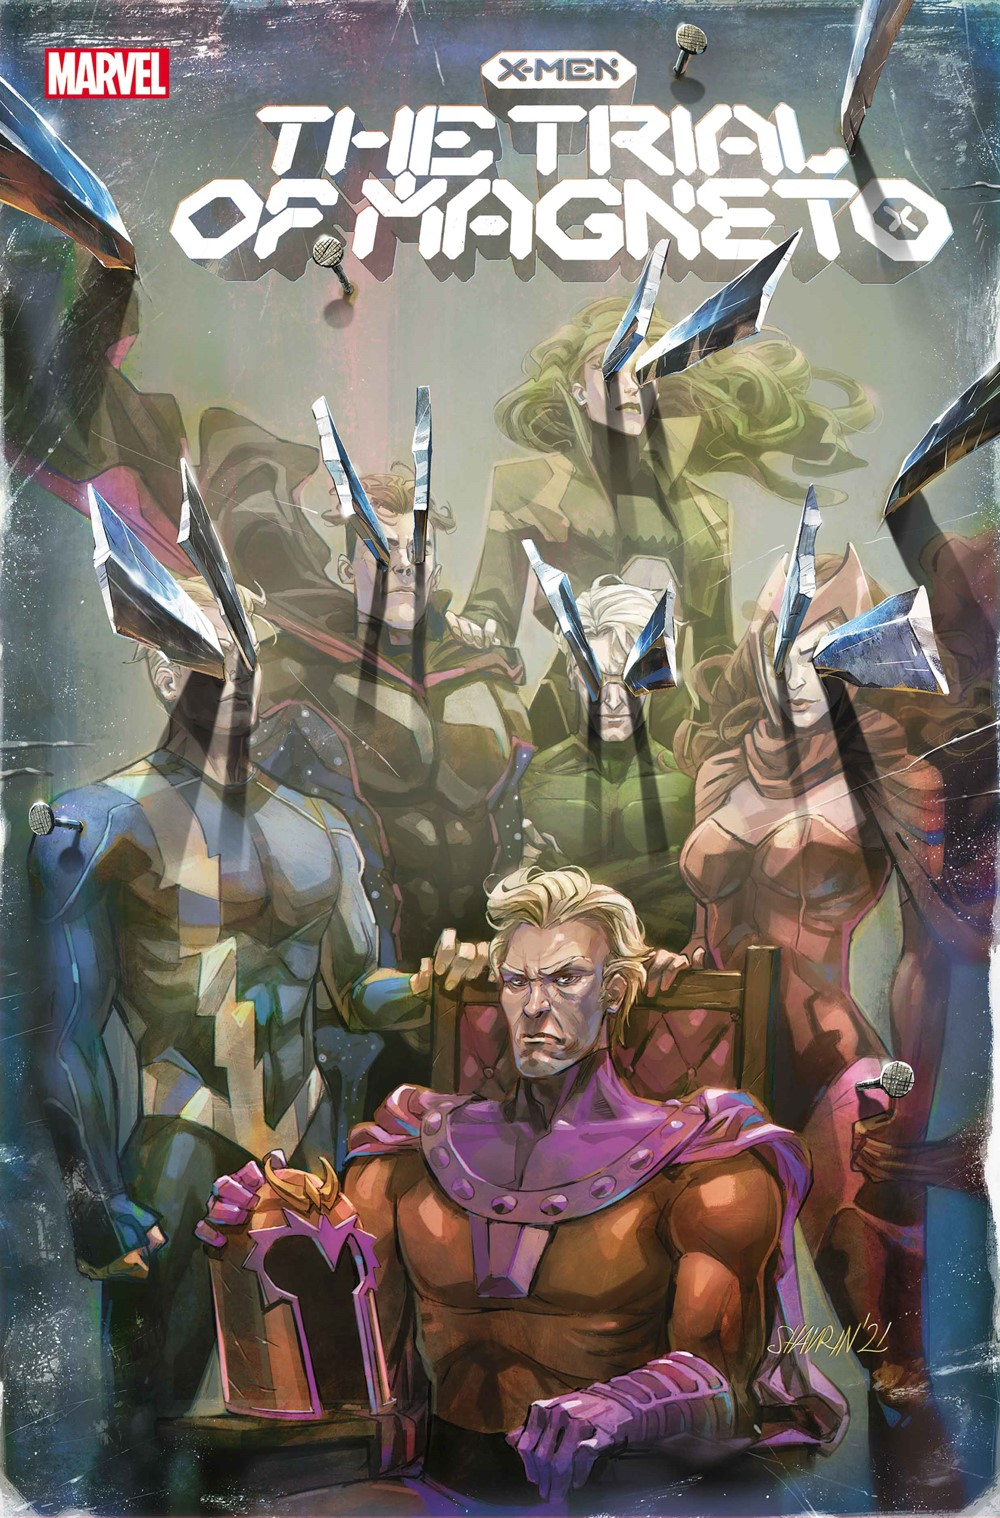 XMENTRIAL2021002_ShavrinVar Marvel Comics September 2021 Solicitations